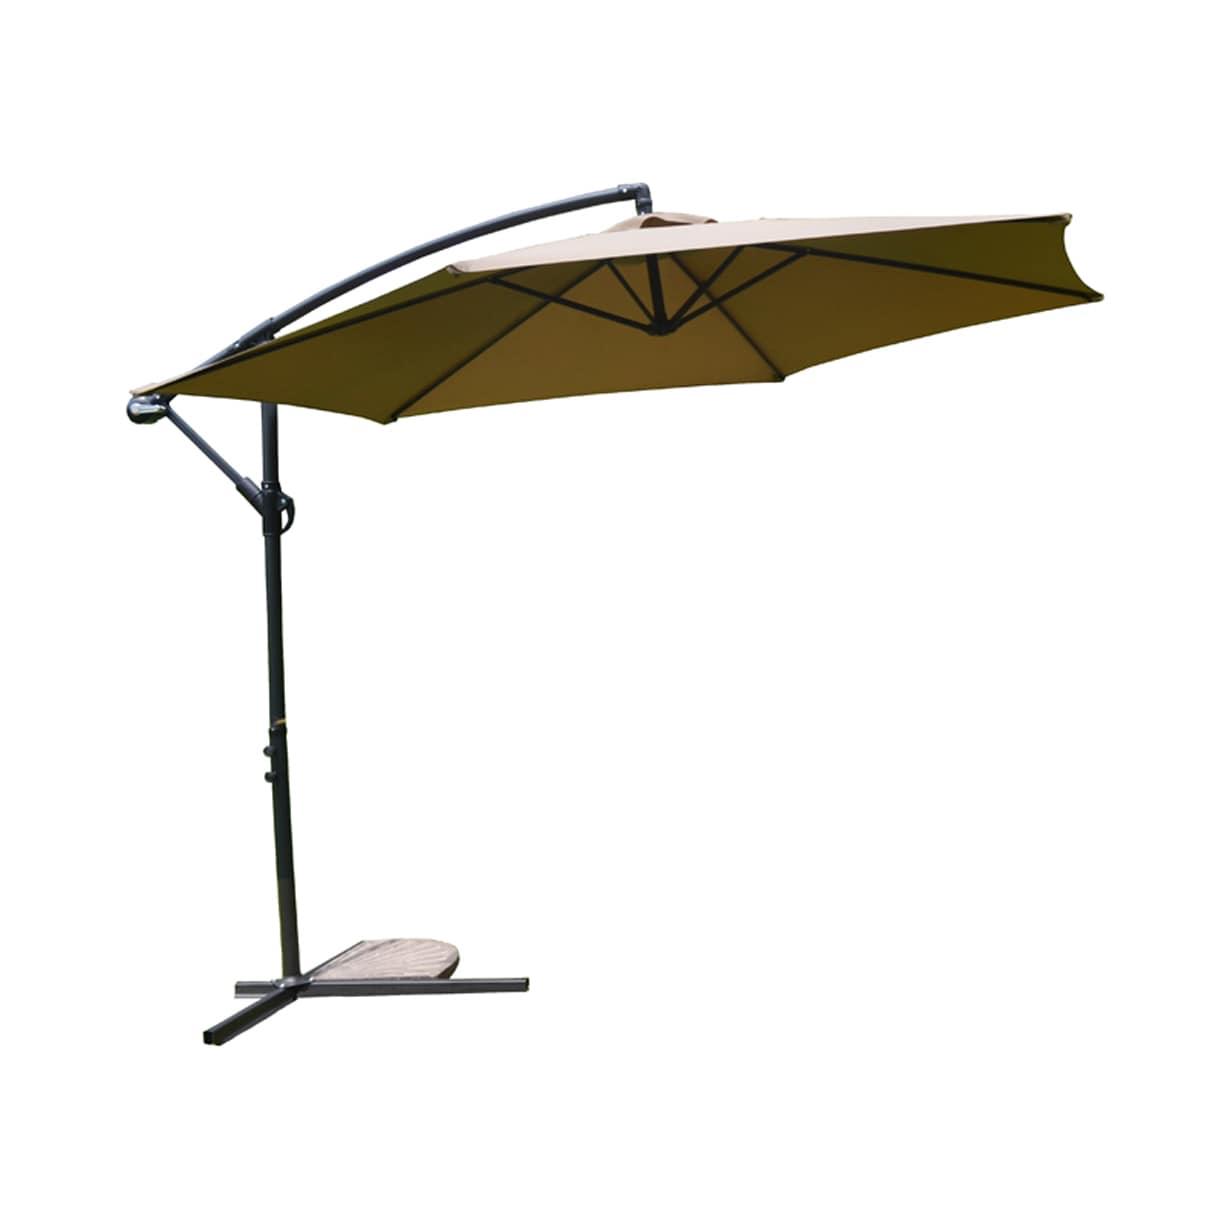 MCombo 10ft Steel Umbrella Patio Sun Shade Beach Crank Ti...